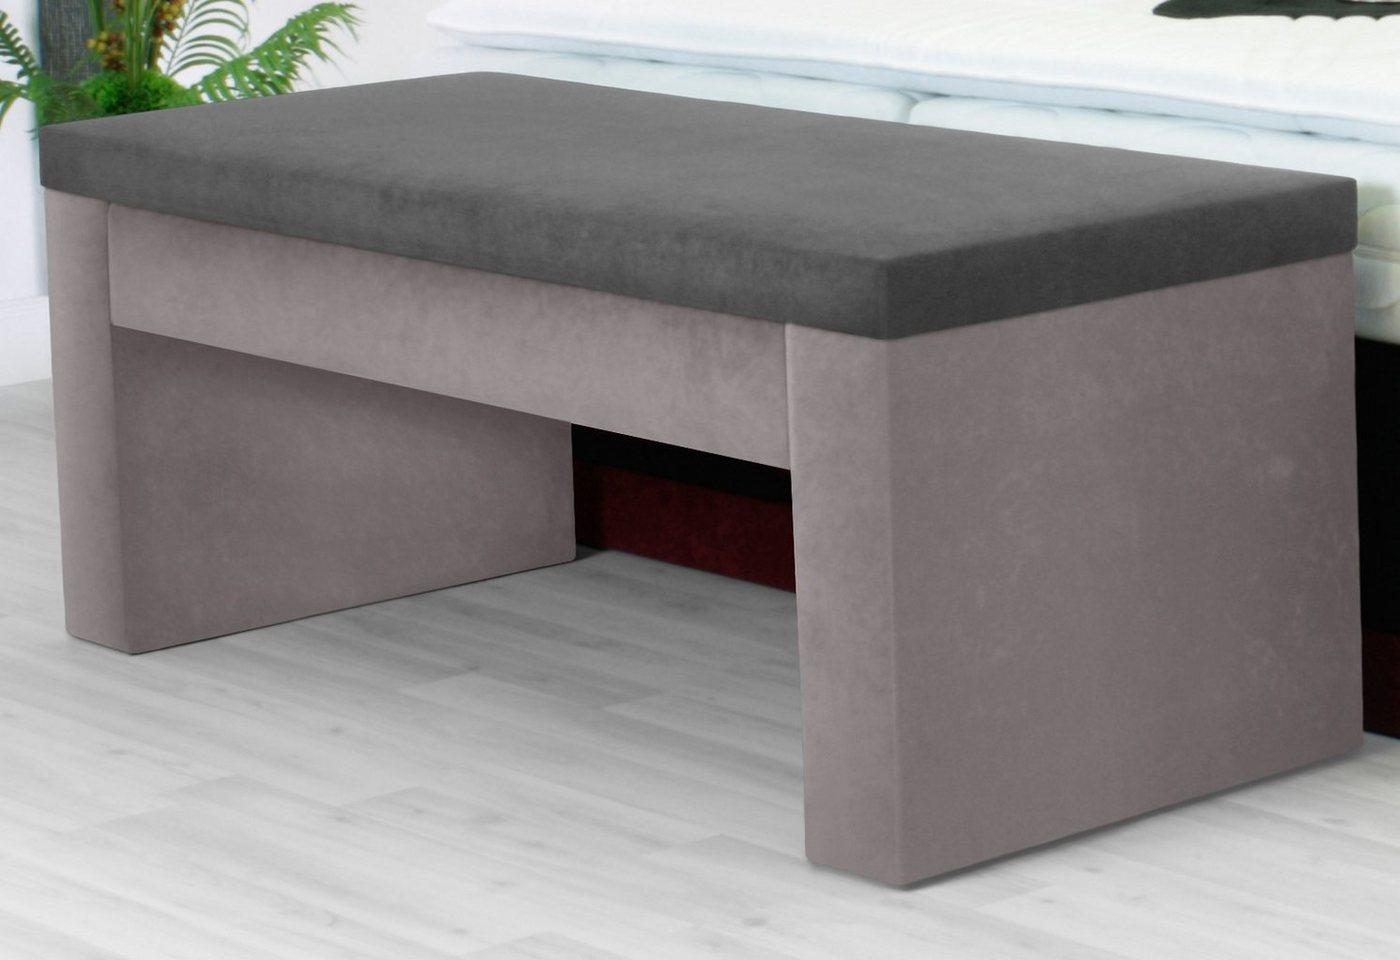 Bettbänke und Truhen - Westfalia Schlafkomfort Bettbank  - Onlineshop OTTO